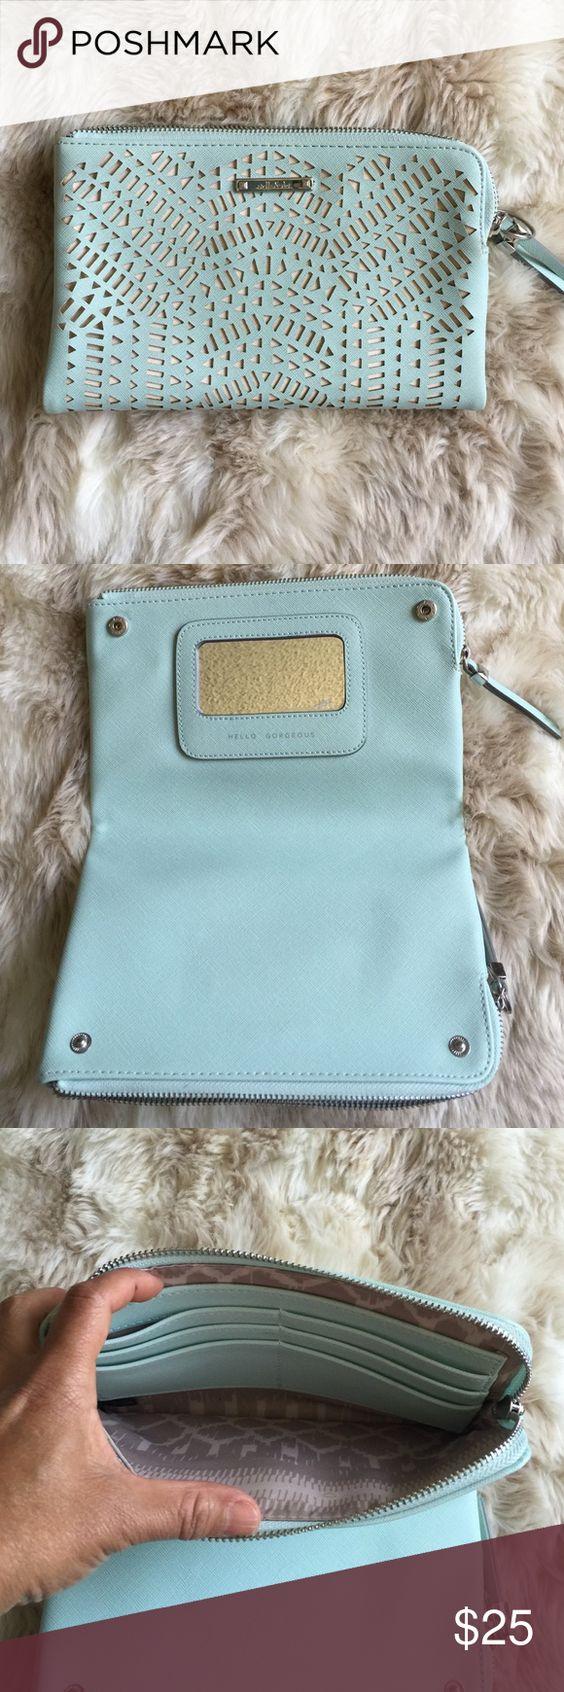 EUC Stella & Dot double clutch Beautiful light blue color clutch.  Used a few times. Stella & Dot Bags Clutches & Wristlets